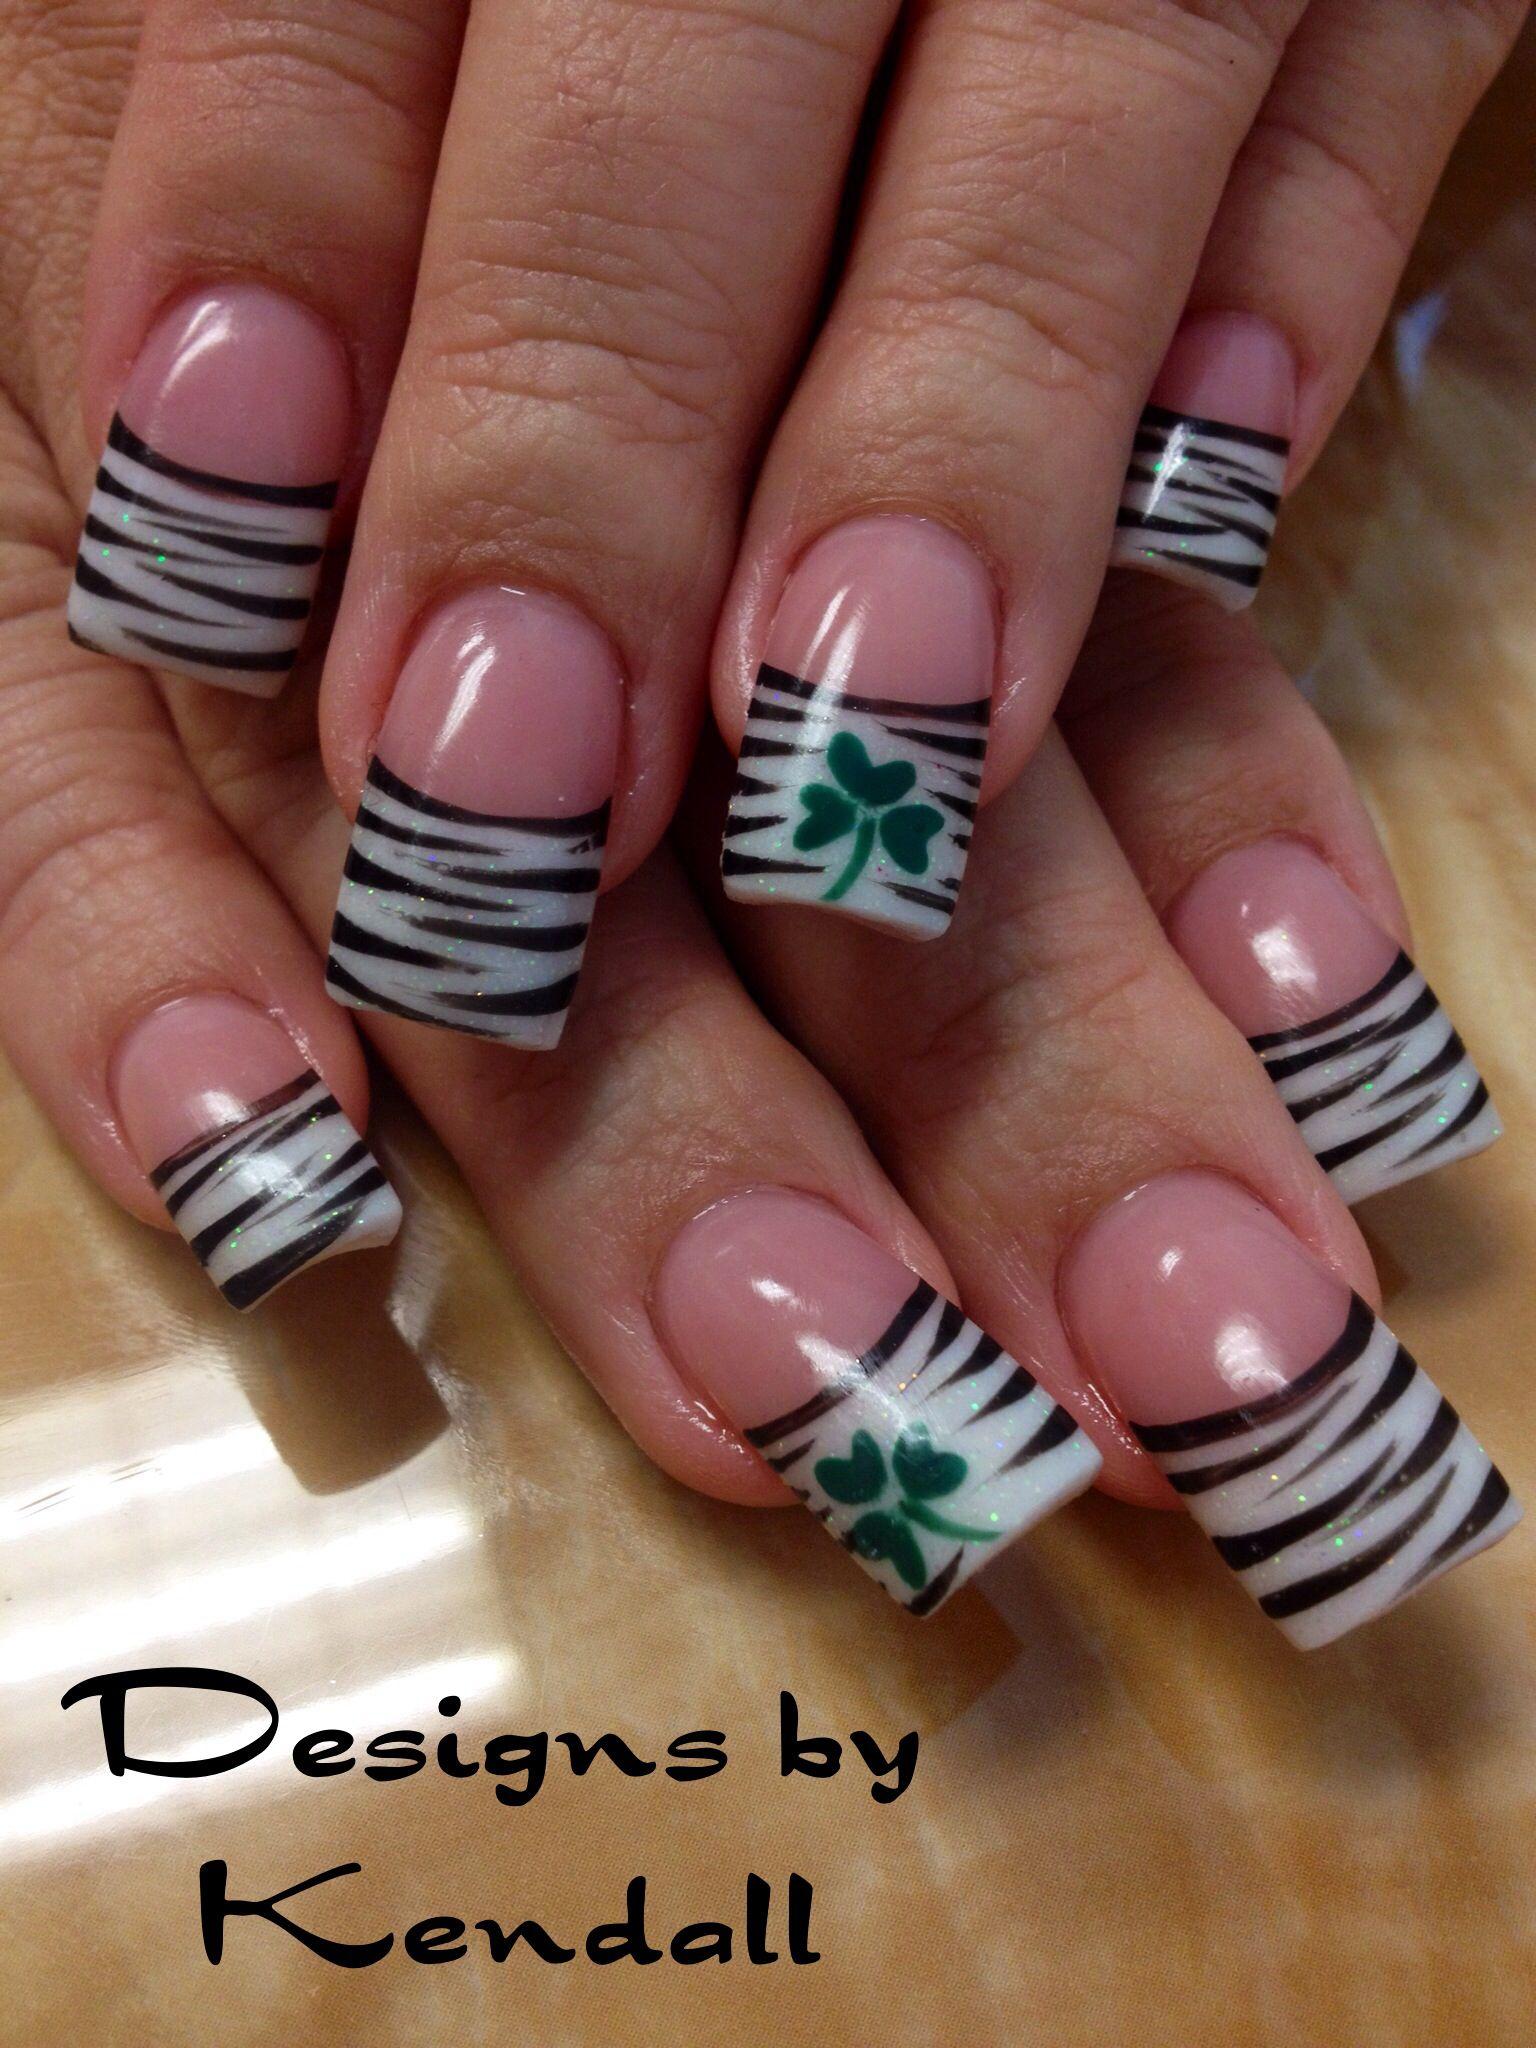 Zebra and shamrock nail designs. - Zebra And Shamrock Nail Designs. Nails By Kendall Pinterest